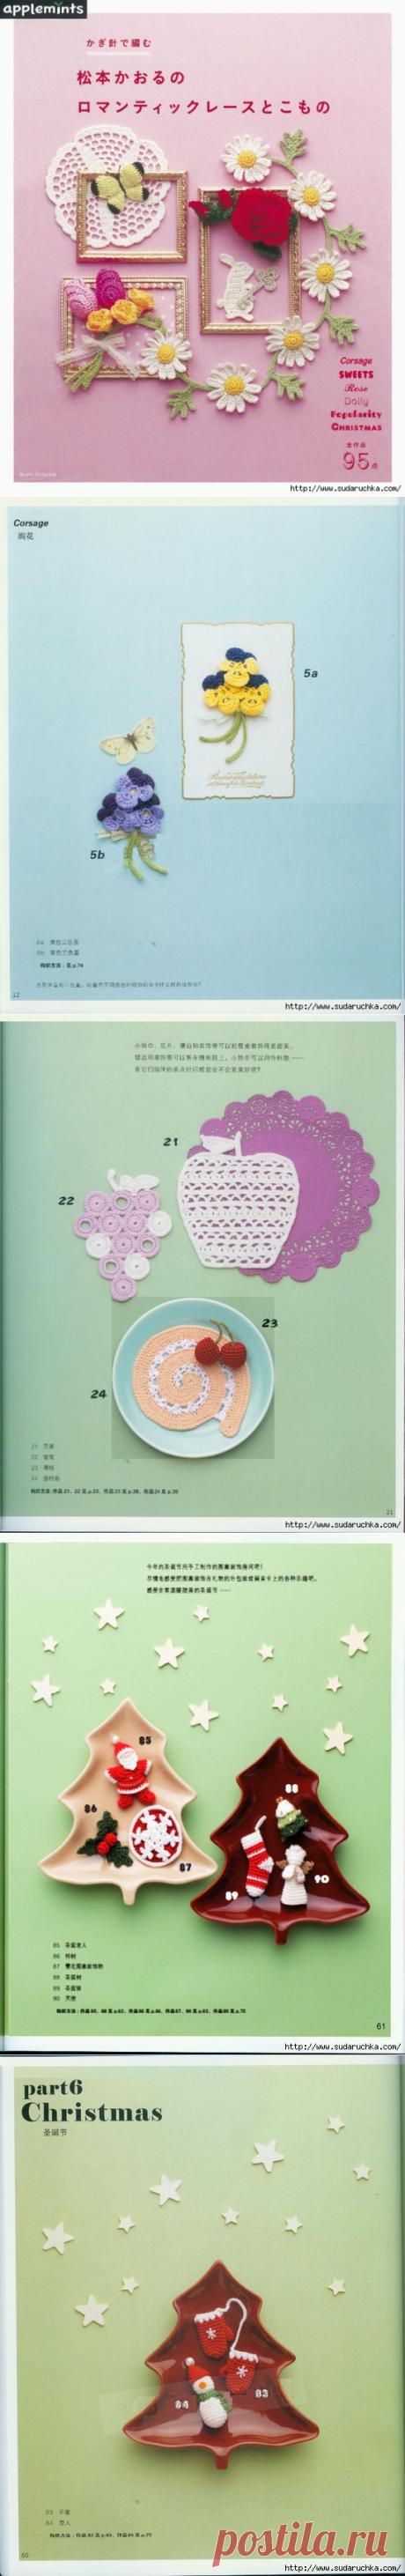 Asahi. Romantic Crochet. Журнал по вязанию.